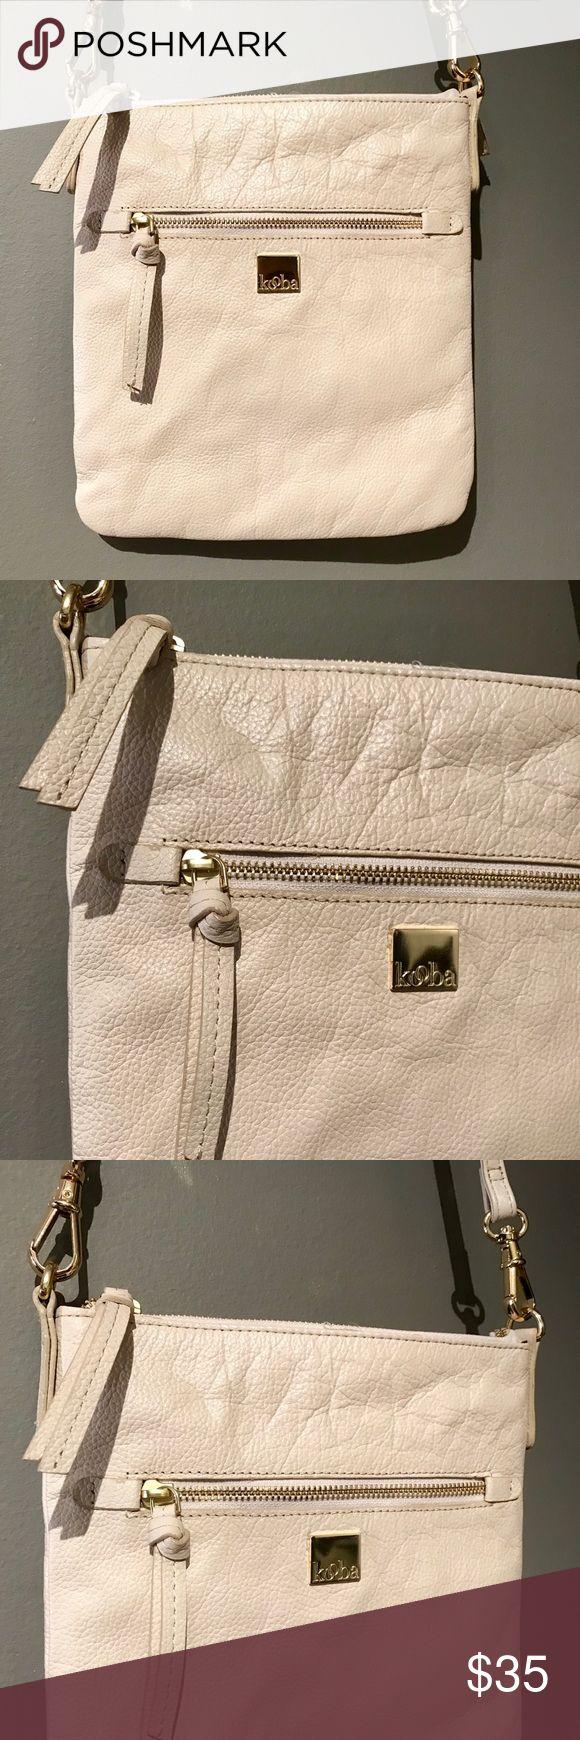 Kooba pebbled leather crossbody handbag Kooba pebbled leather crossbody in stone with interior zipper, cell phone and utility pockets and a back pocket. Has a 24 inch adjustable and removable strap. Kooba Bags Crossbody Bags